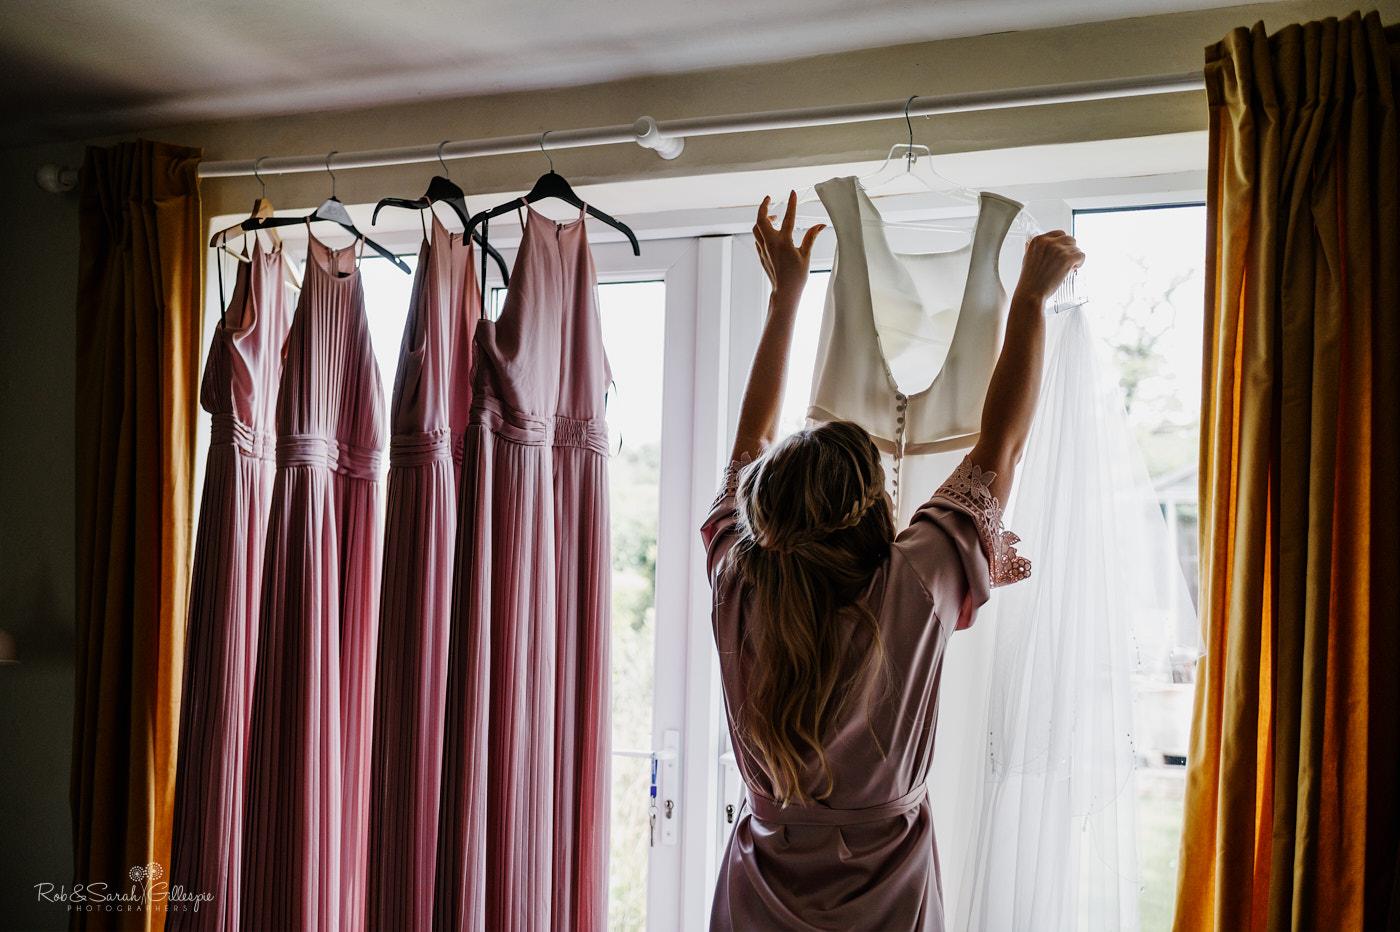 Bridesmaid adjusting wedding dress hanging in window